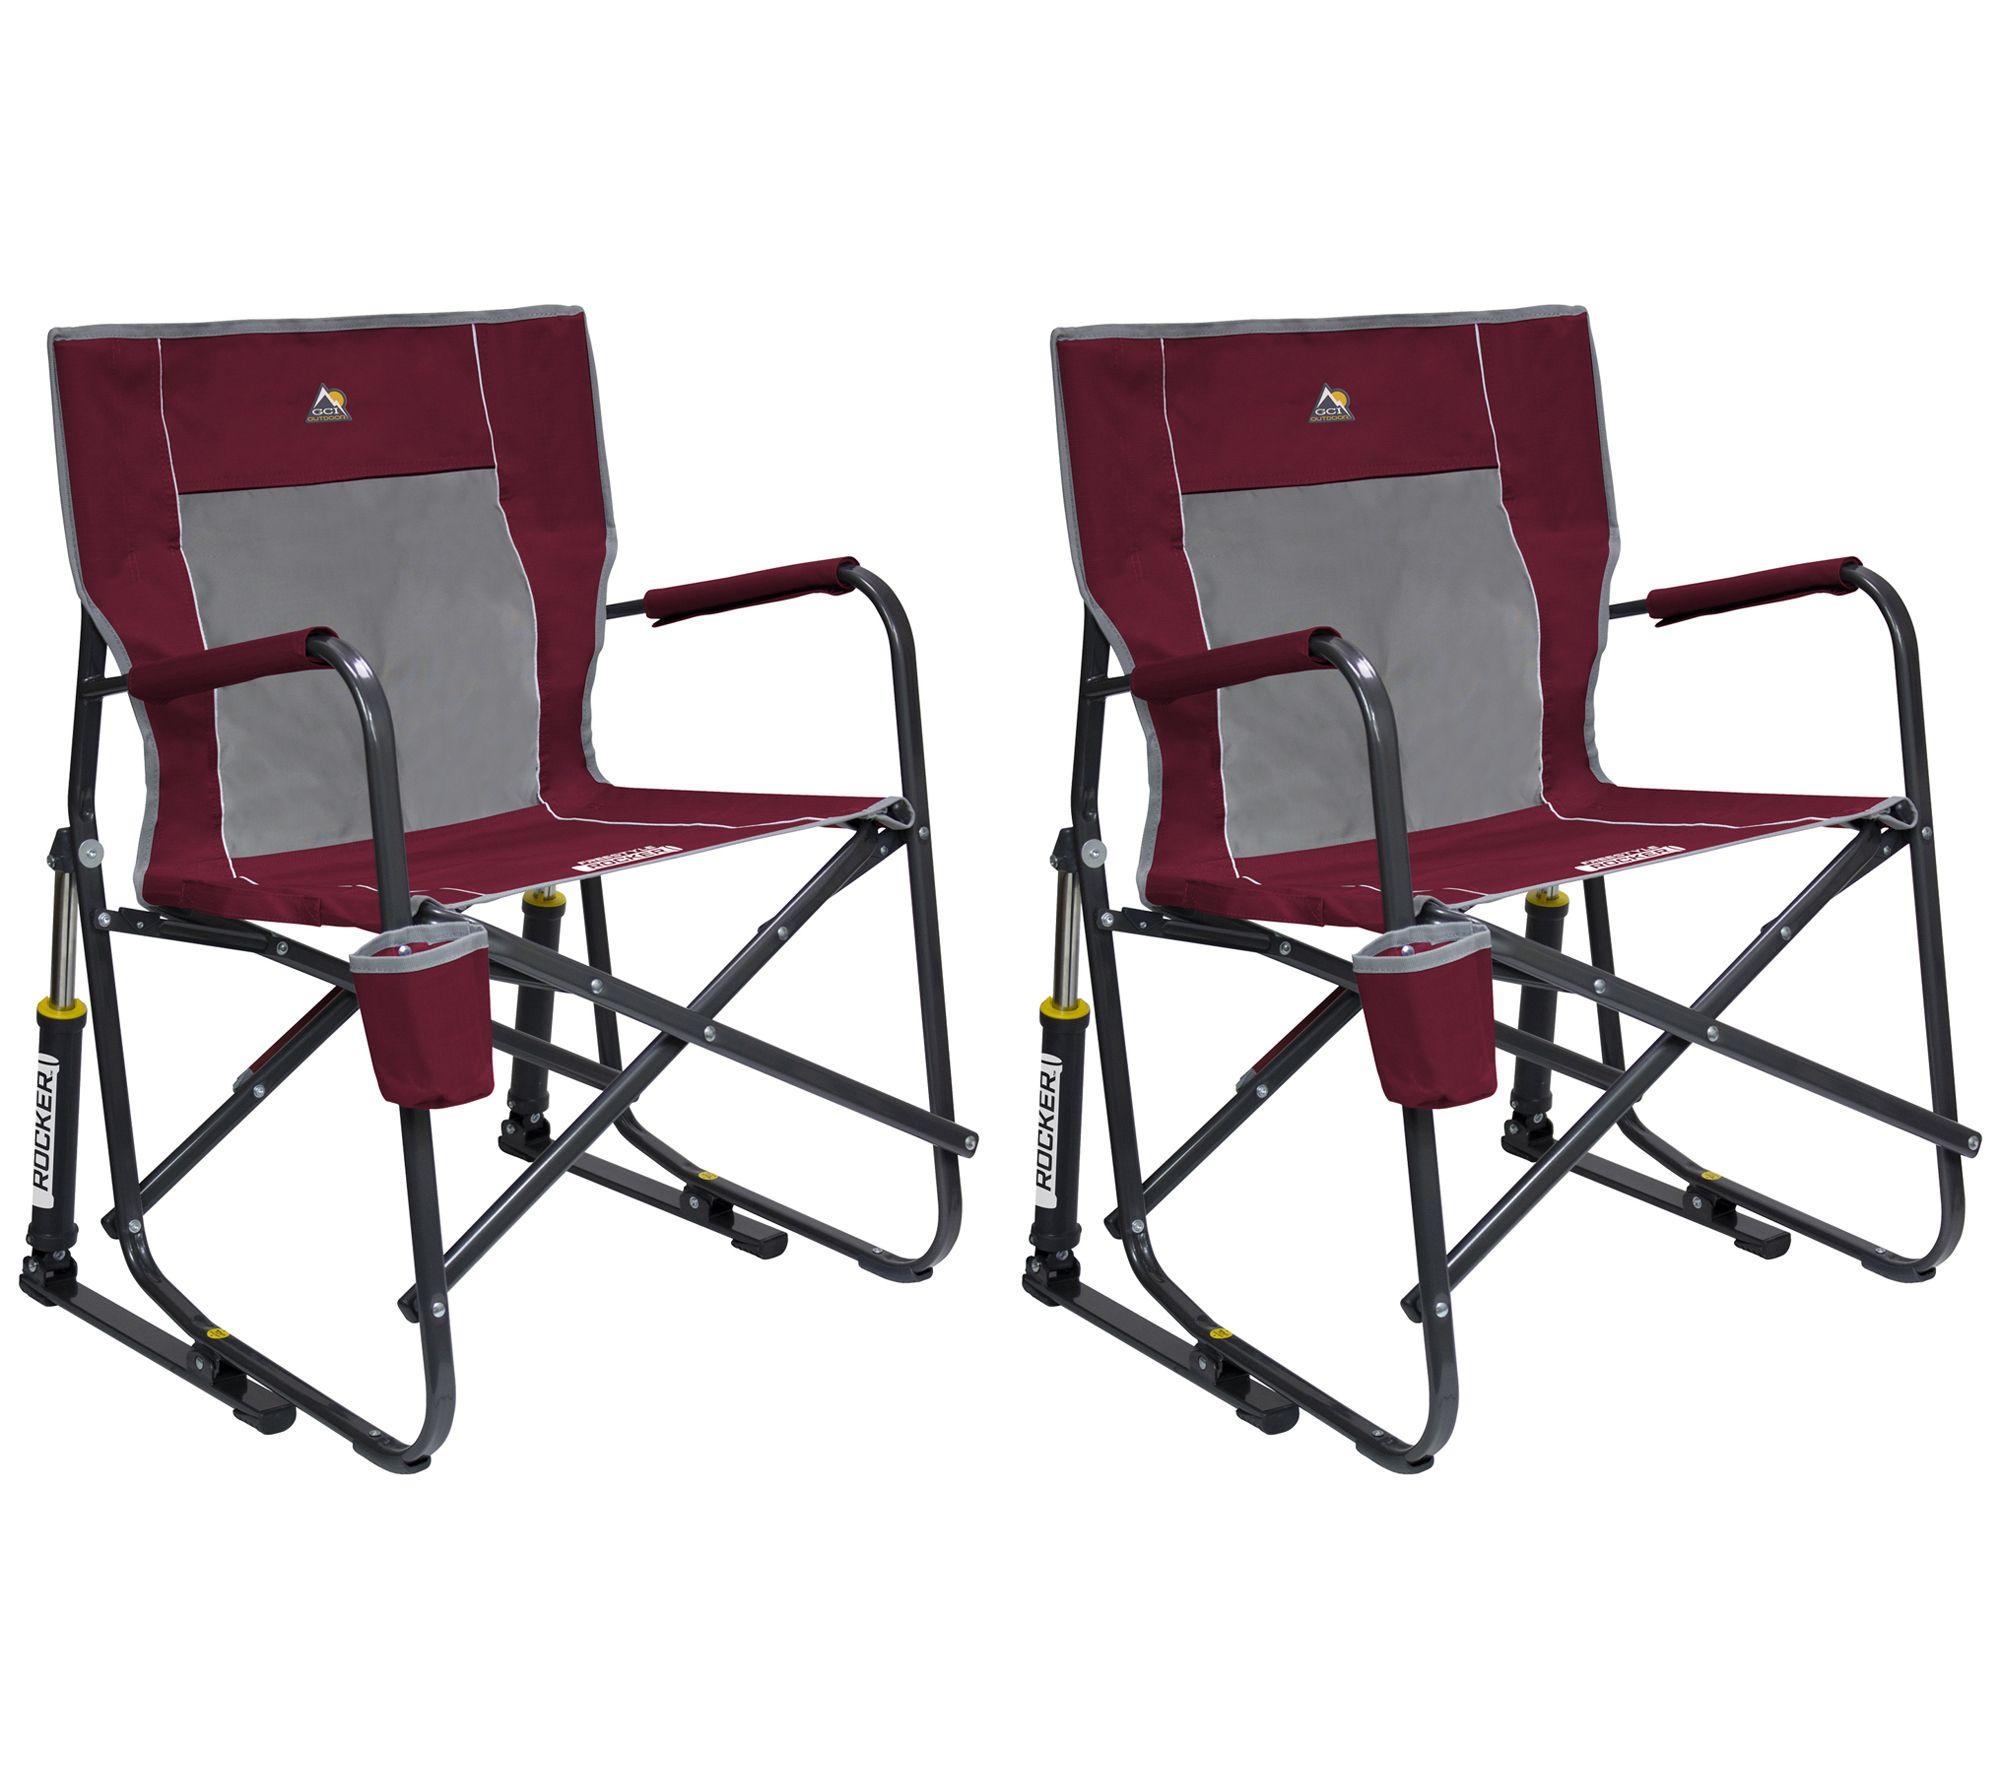 Stupendous Gci Outdoor S 2 Freestyle Rocker Chairs Qvc Com Creativecarmelina Interior Chair Design Creativecarmelinacom